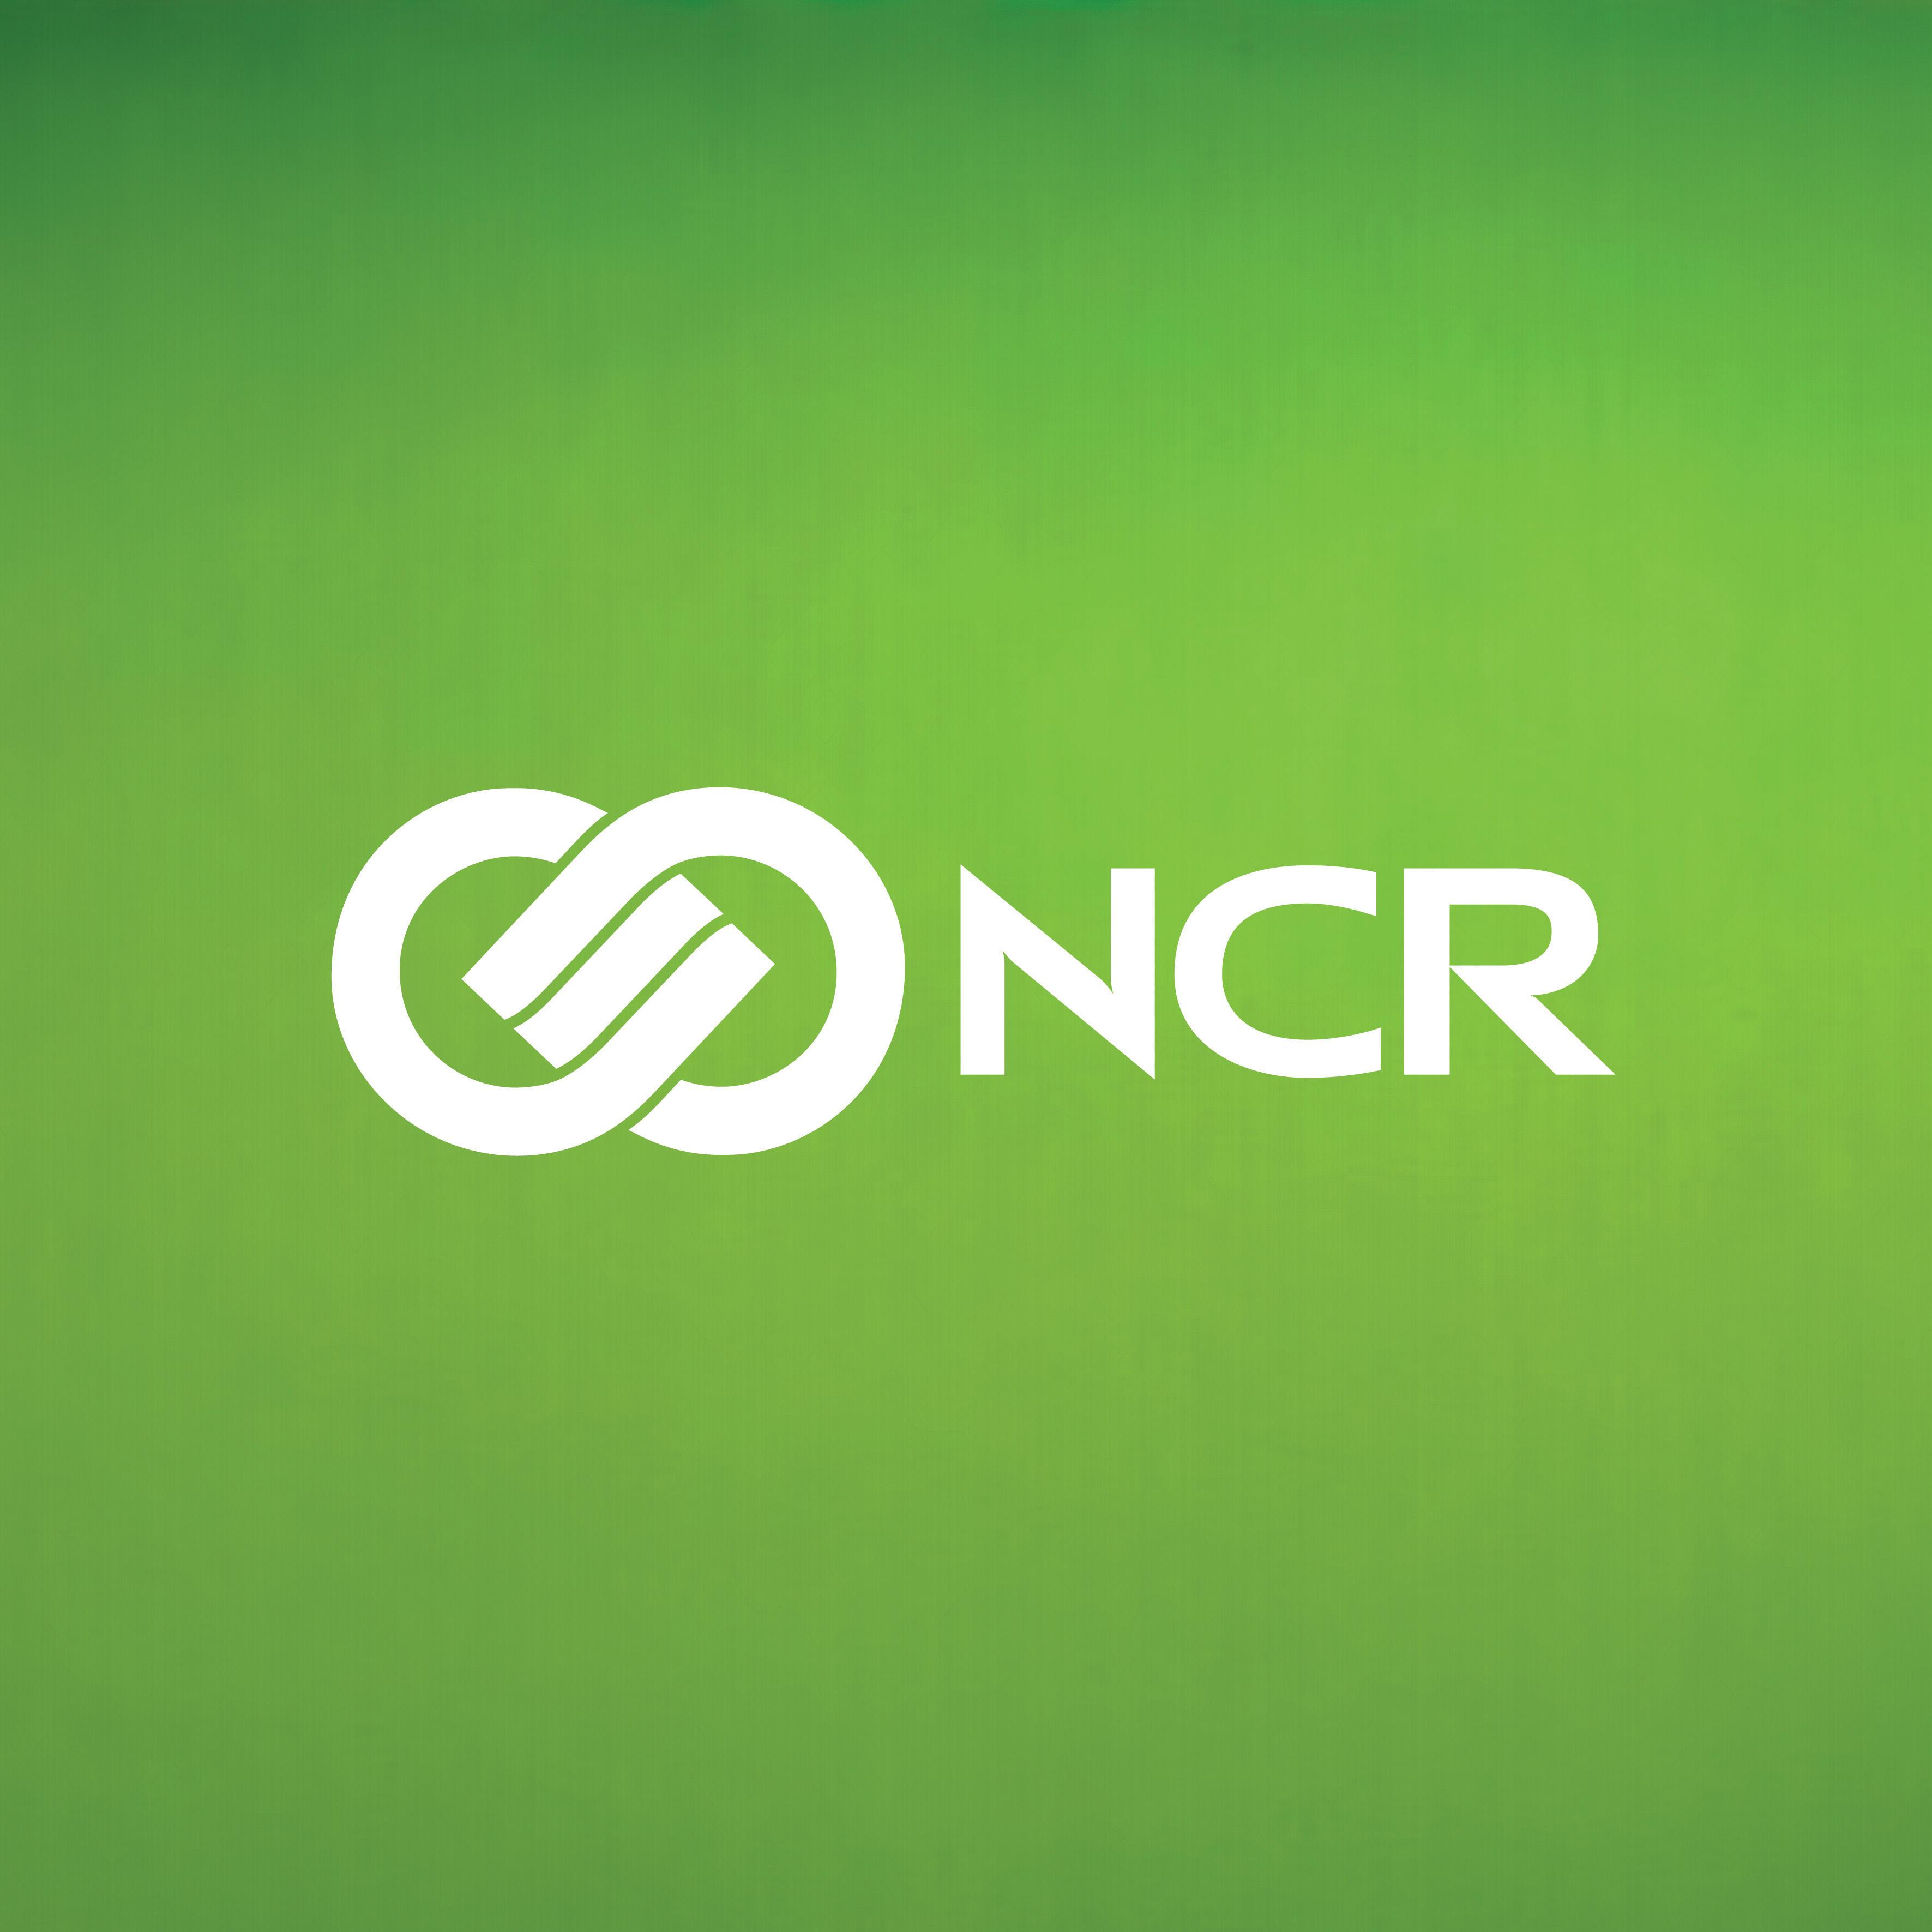 ncr-20201231_g1.jpg